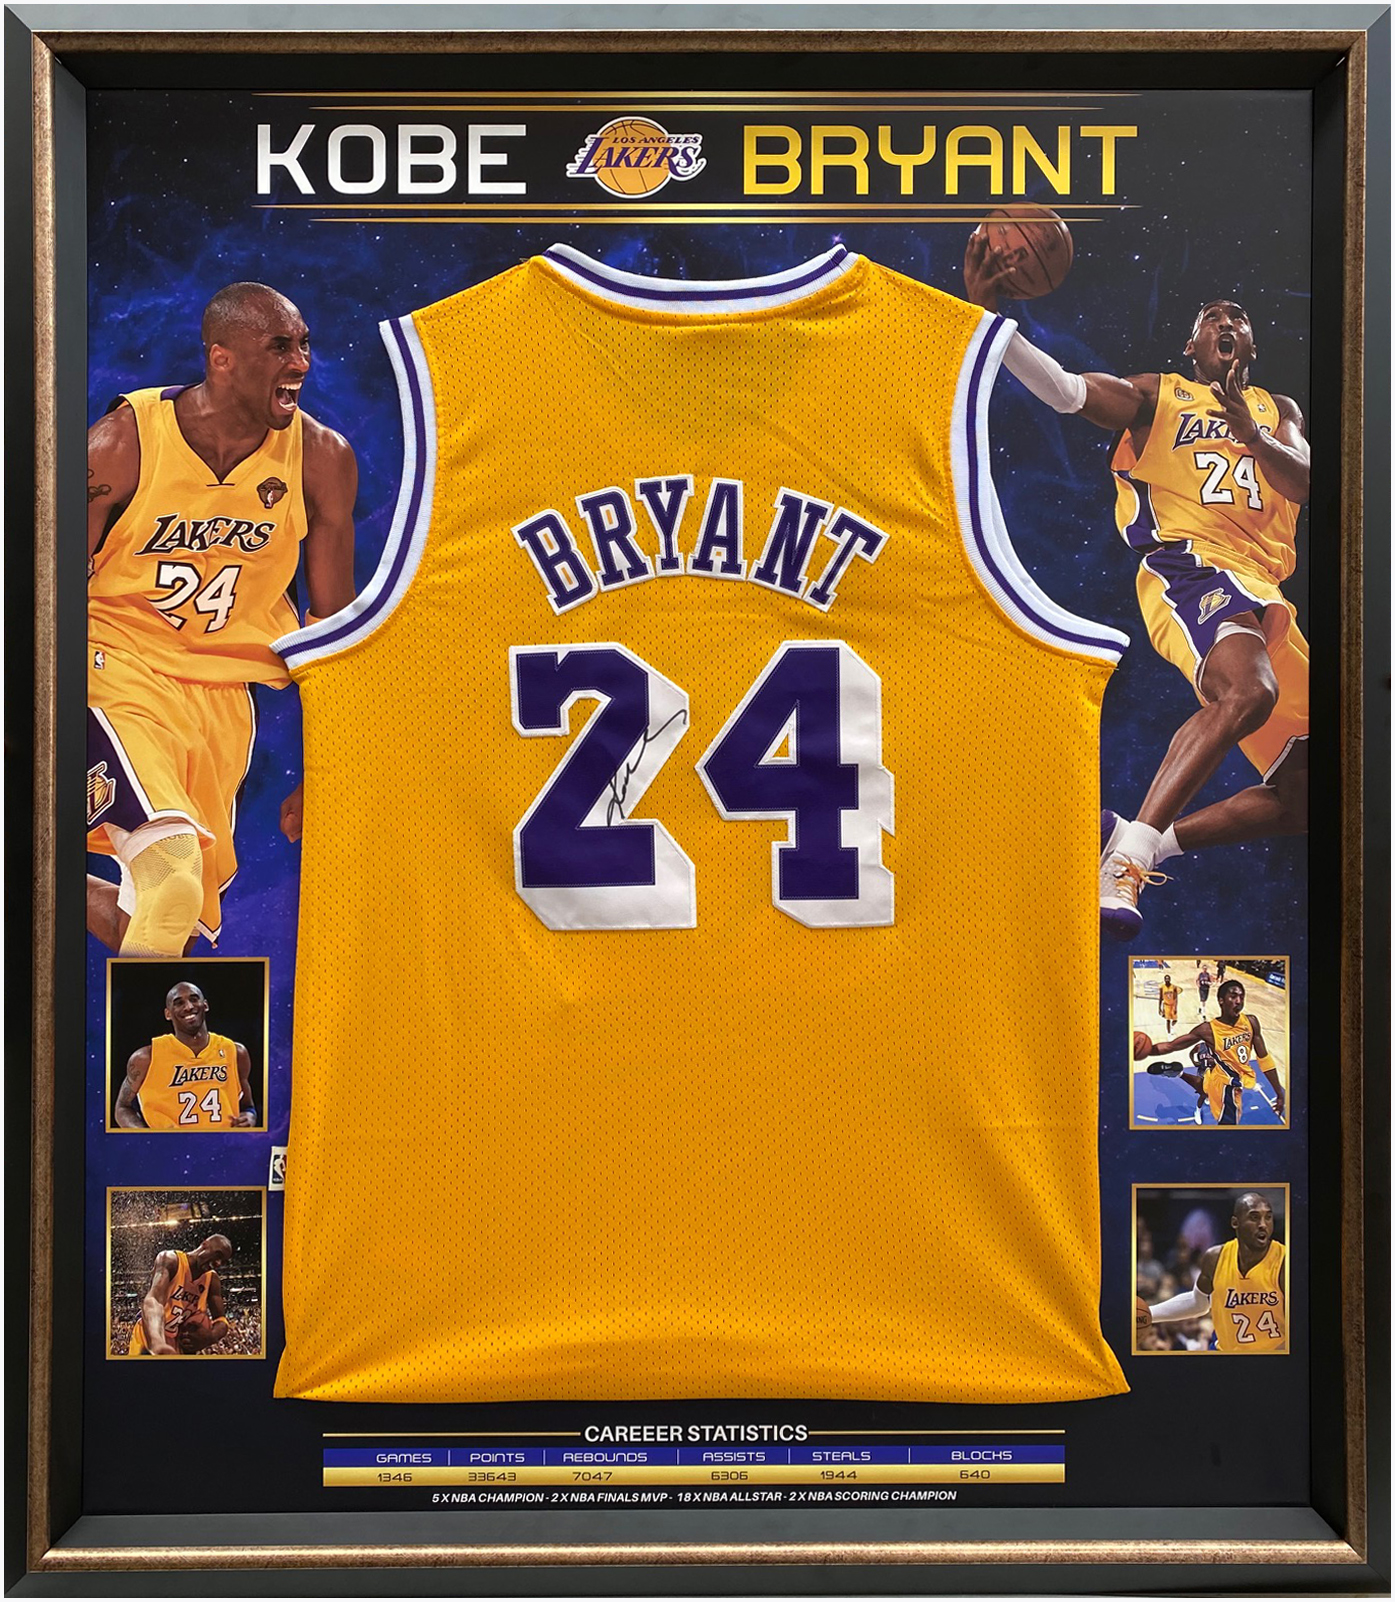 Kobe Bryant #24 Signed NBA LA Lakers Jersey Framed - Panini Certified